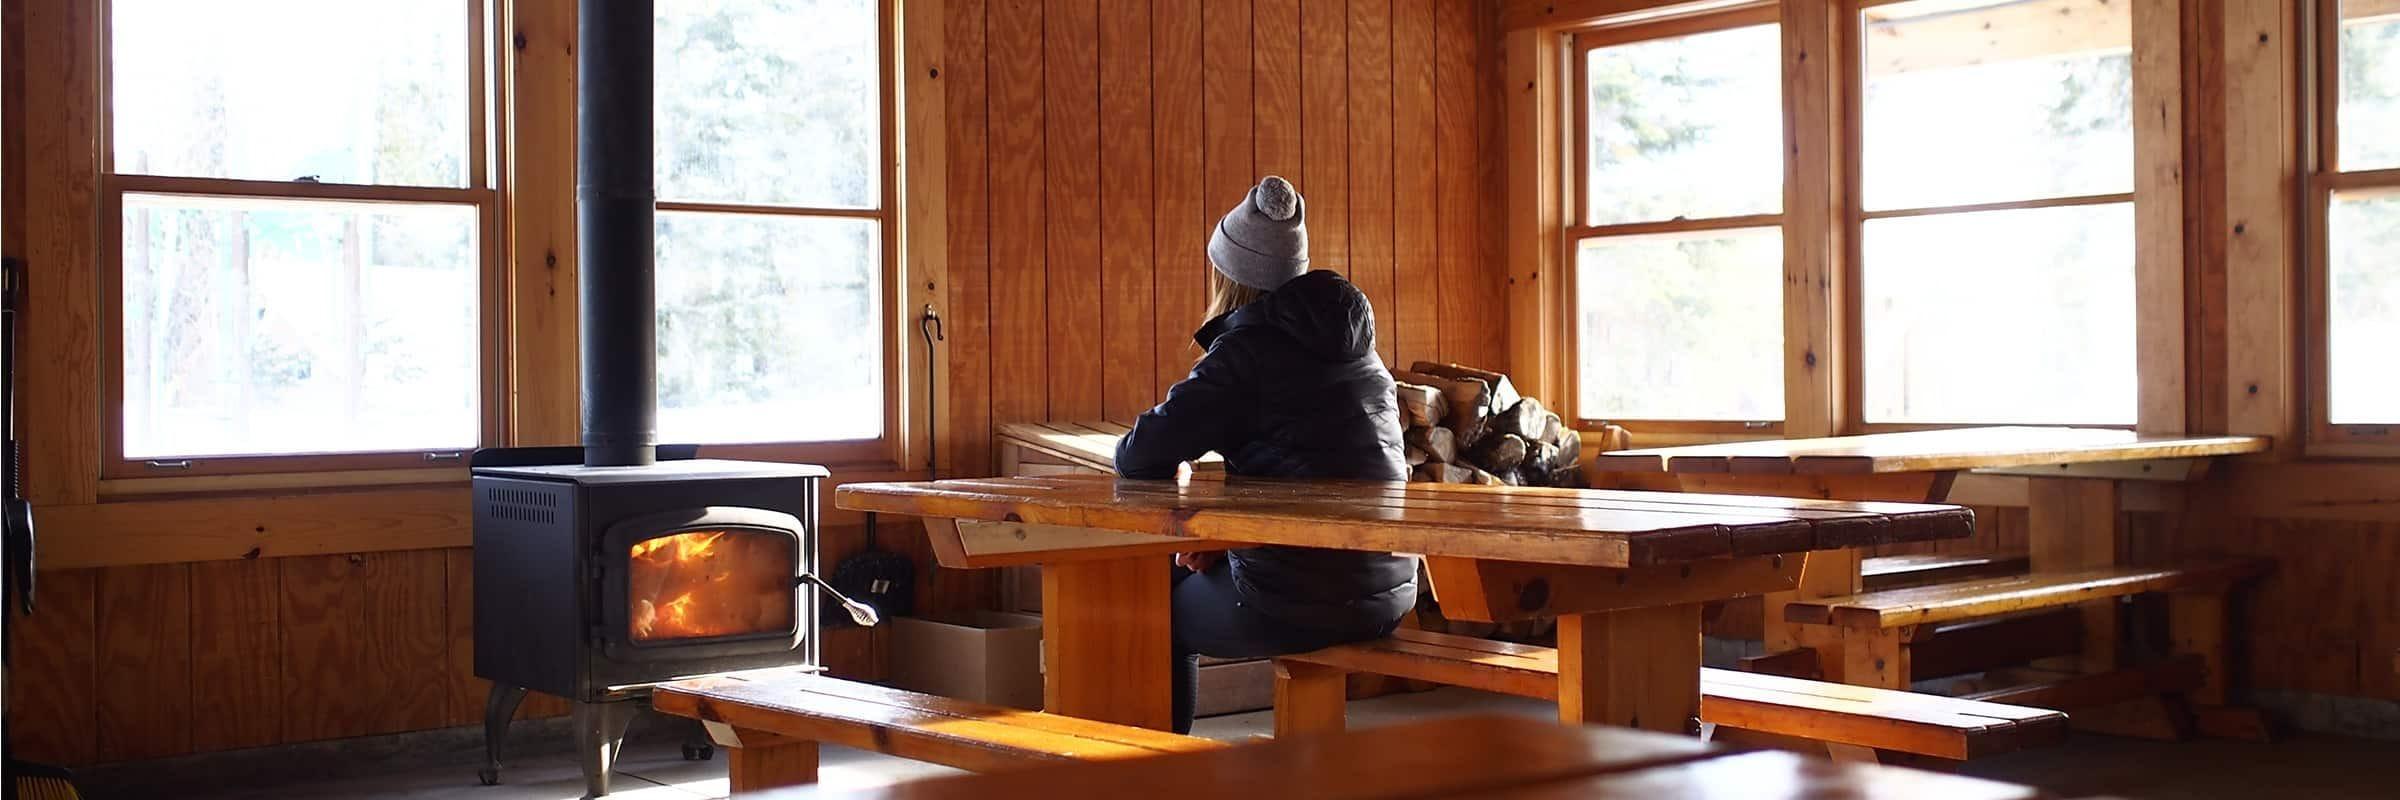 Camping, snowshoeing. L'expérience en tente OTENTik